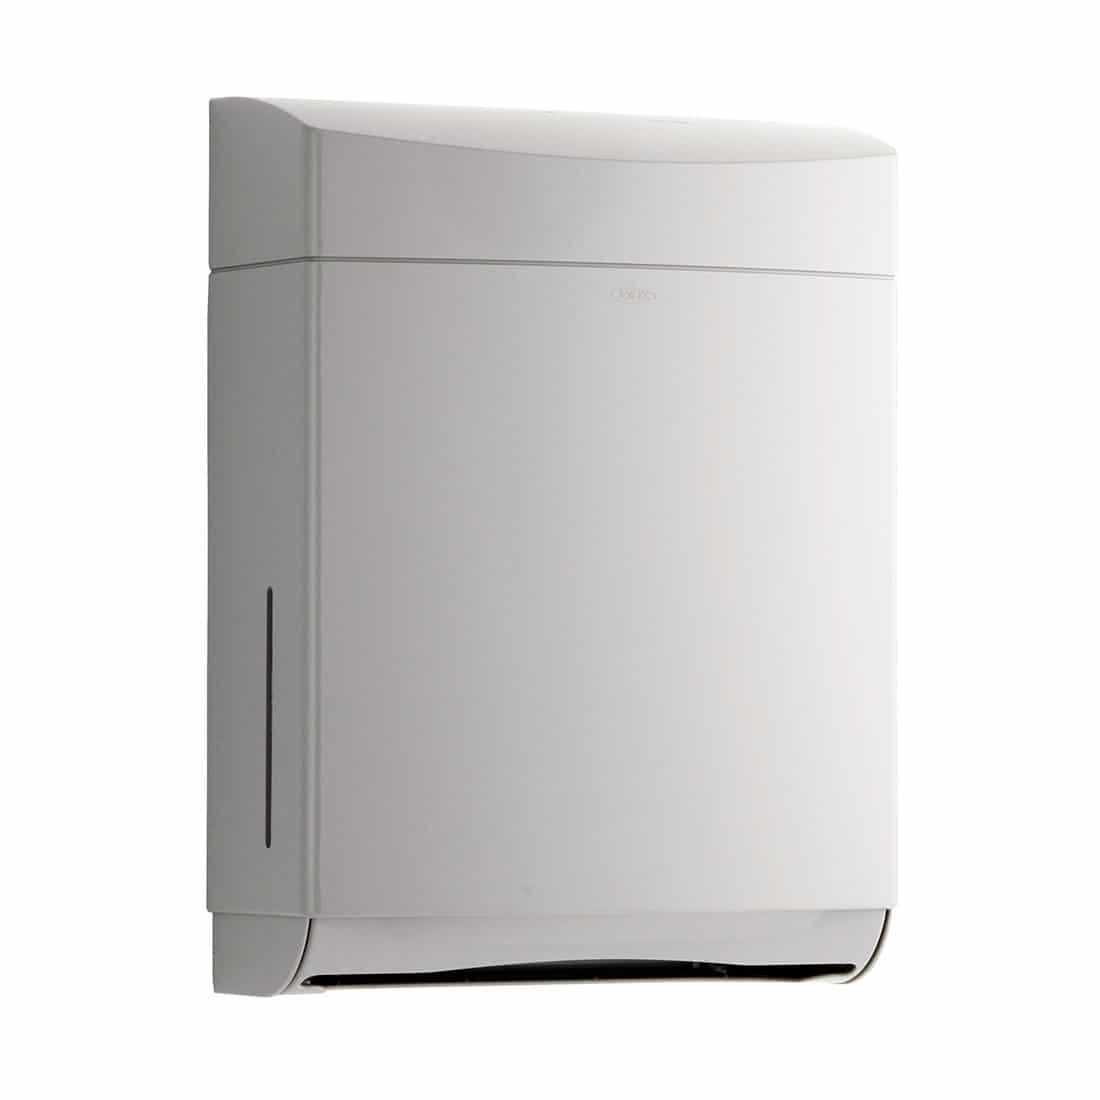 Bobrick Matrix Surface Mount Towel Dispenser B 5262